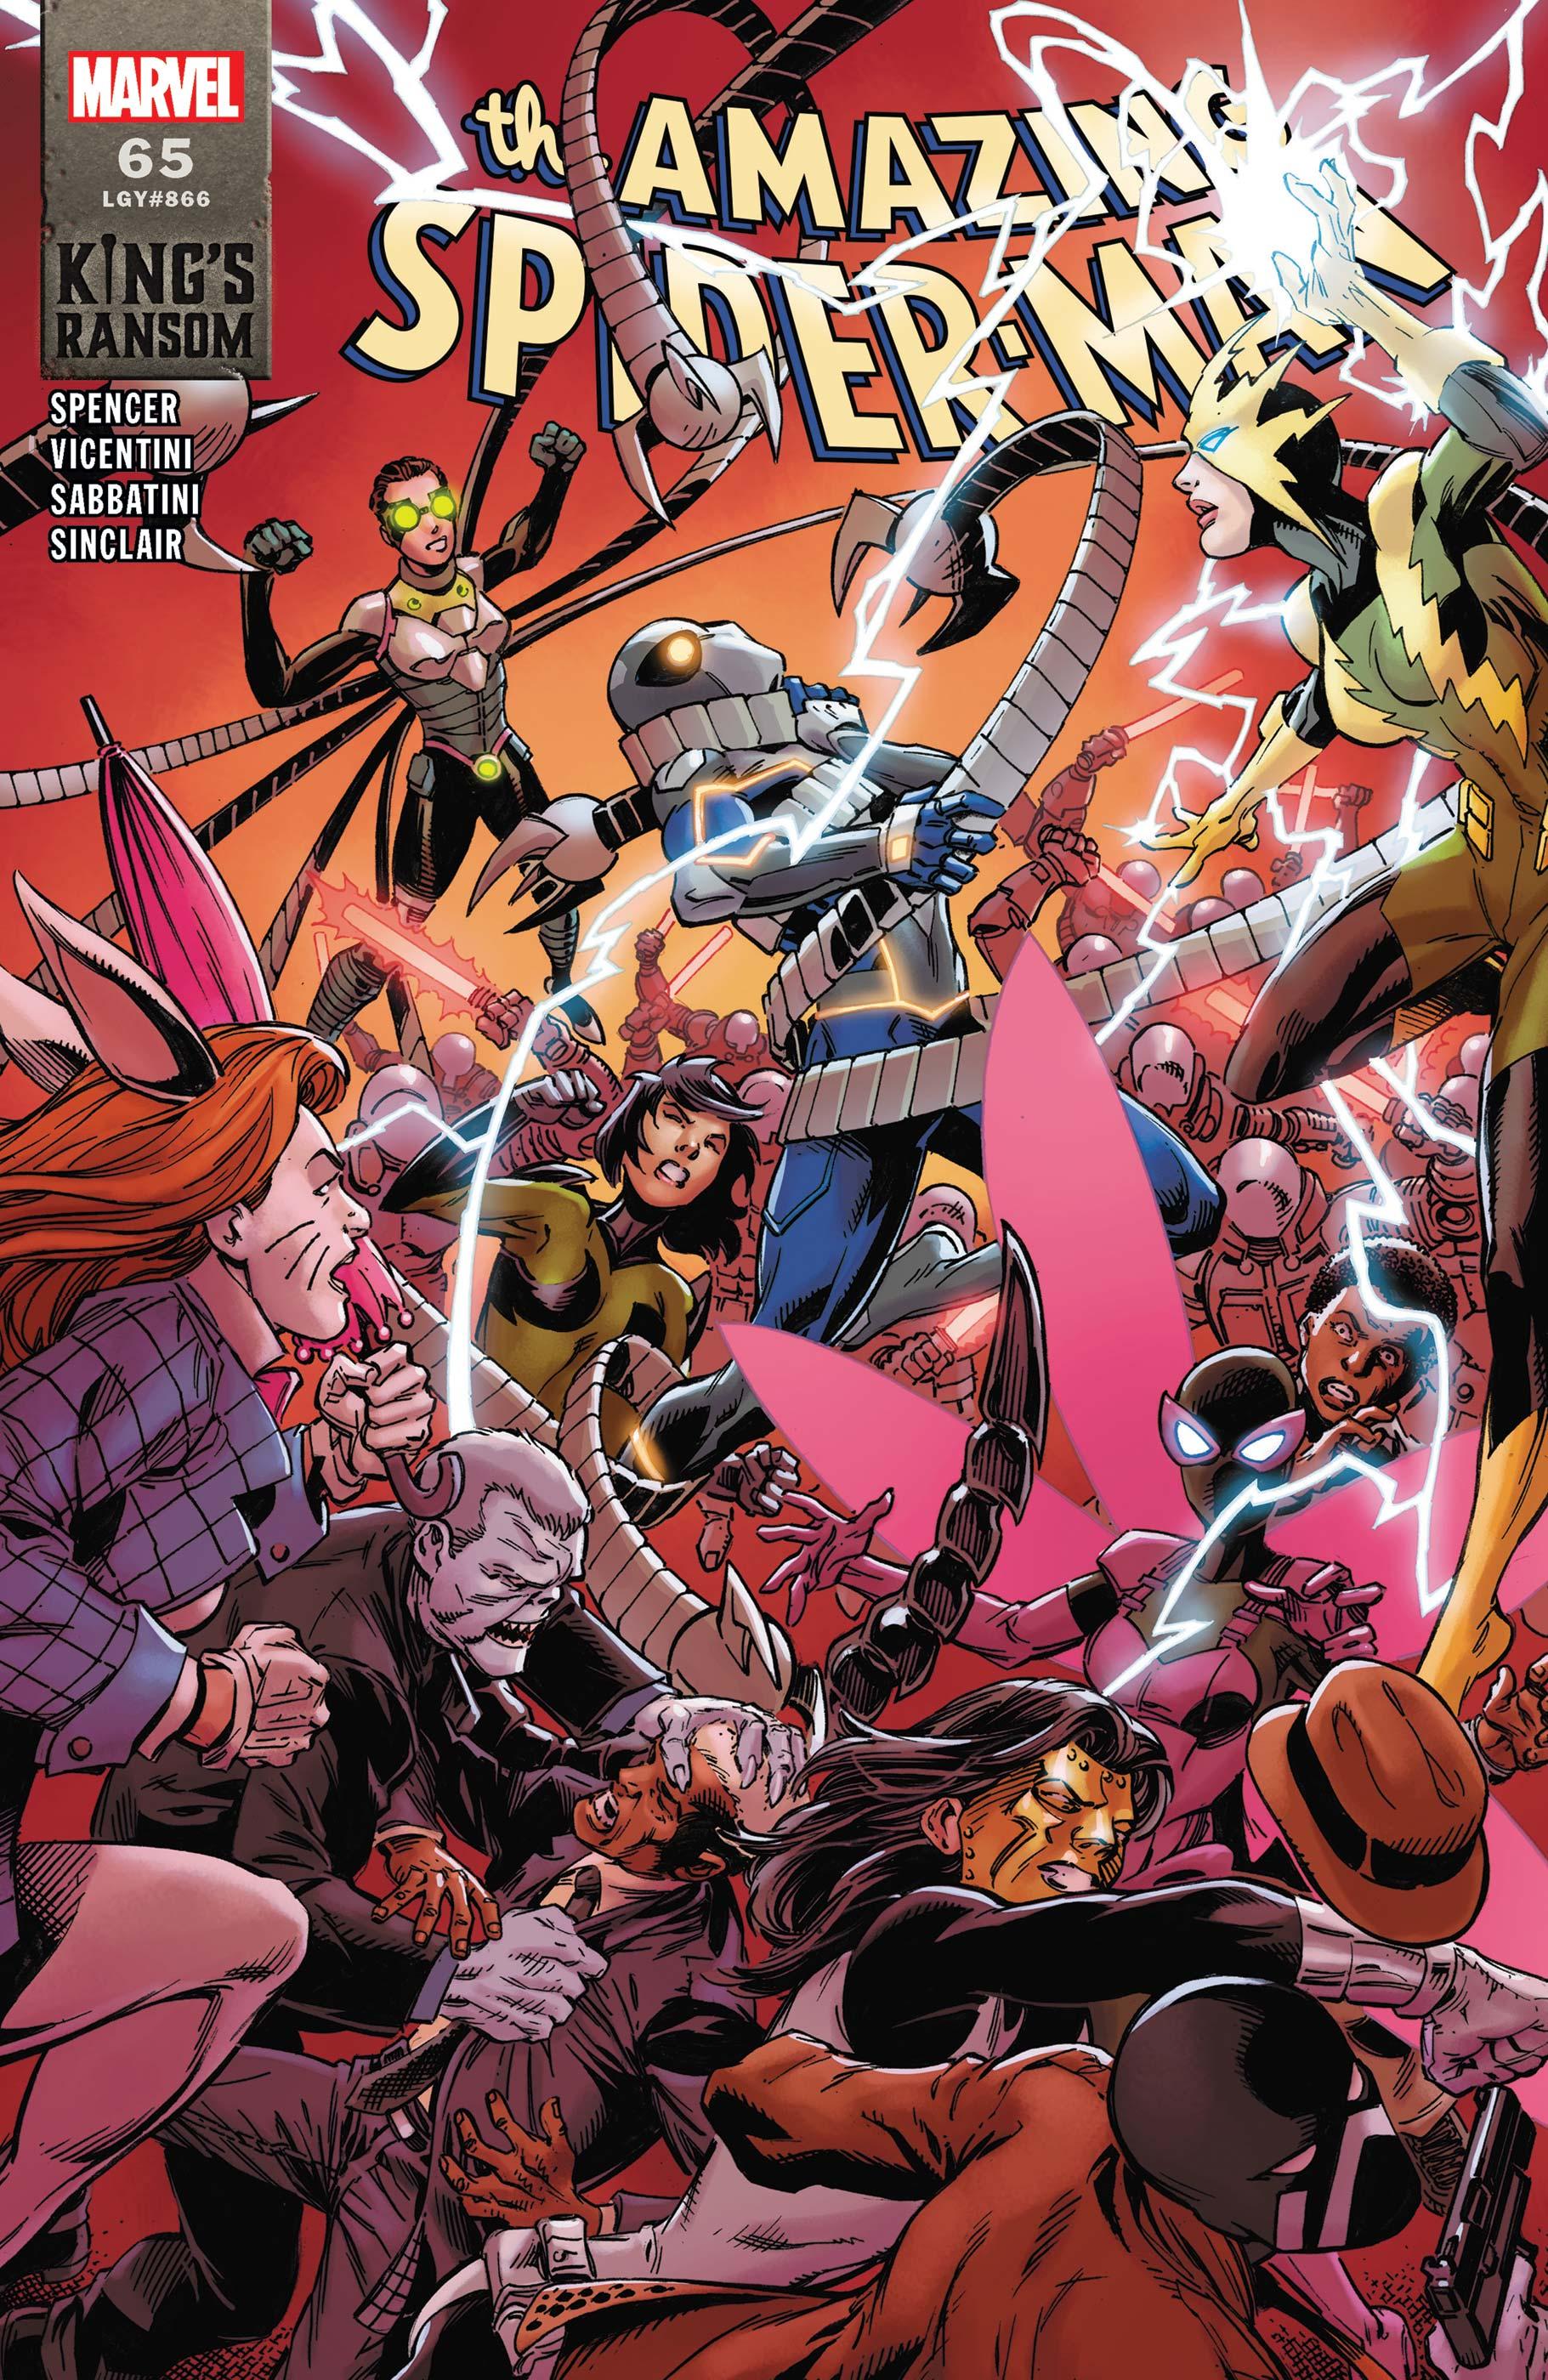 The Amazing Spider-Man (2018) #65